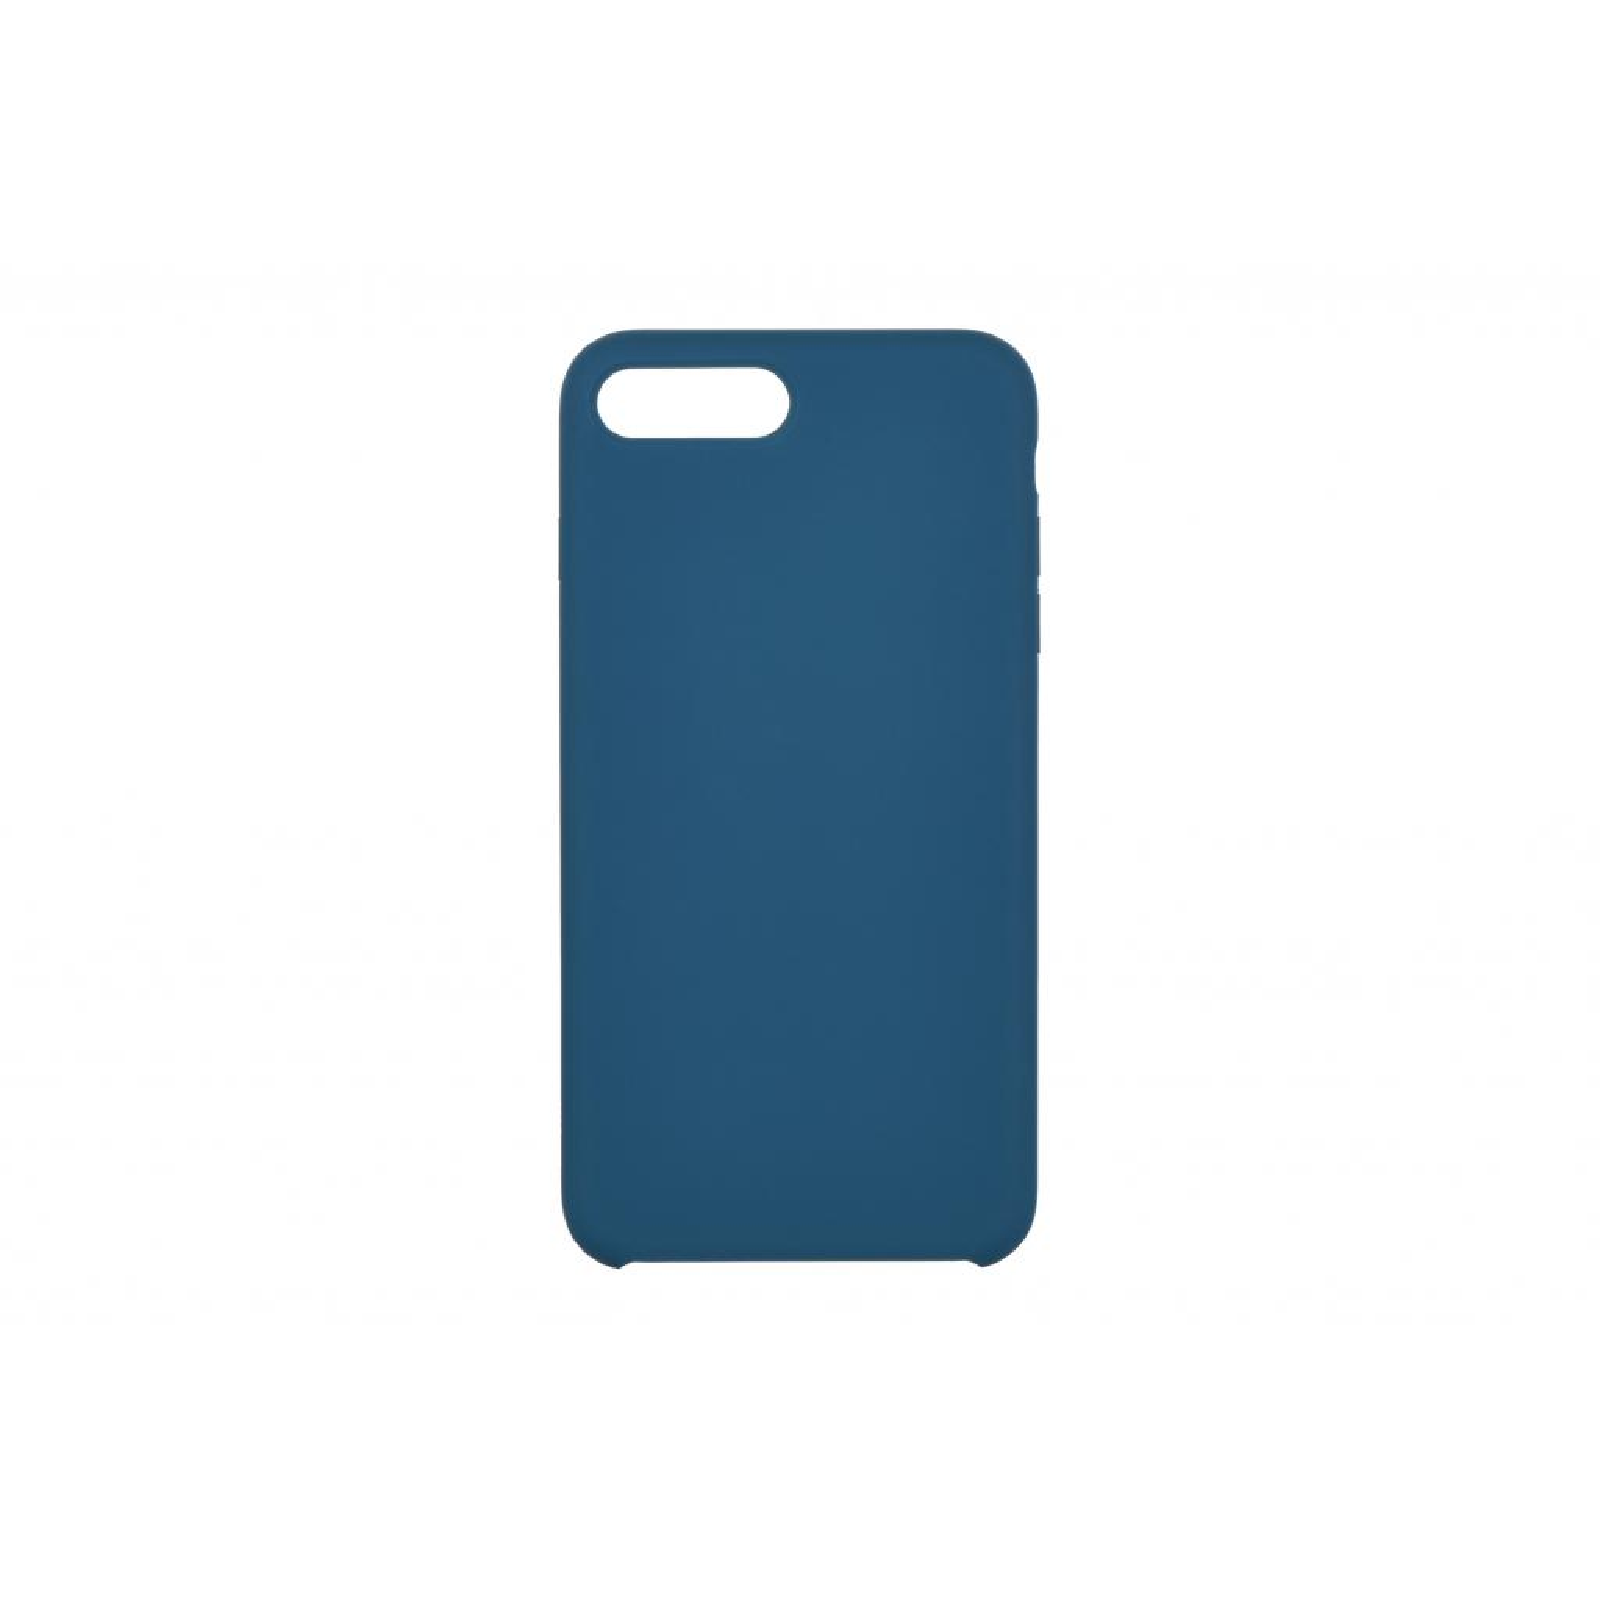 Чохол до моб. телефона 2E Apple iPhone 7/8 Plus, Liquid Silicone, Light Purple (2E-IPH-7/8P-NKSLS-LP)